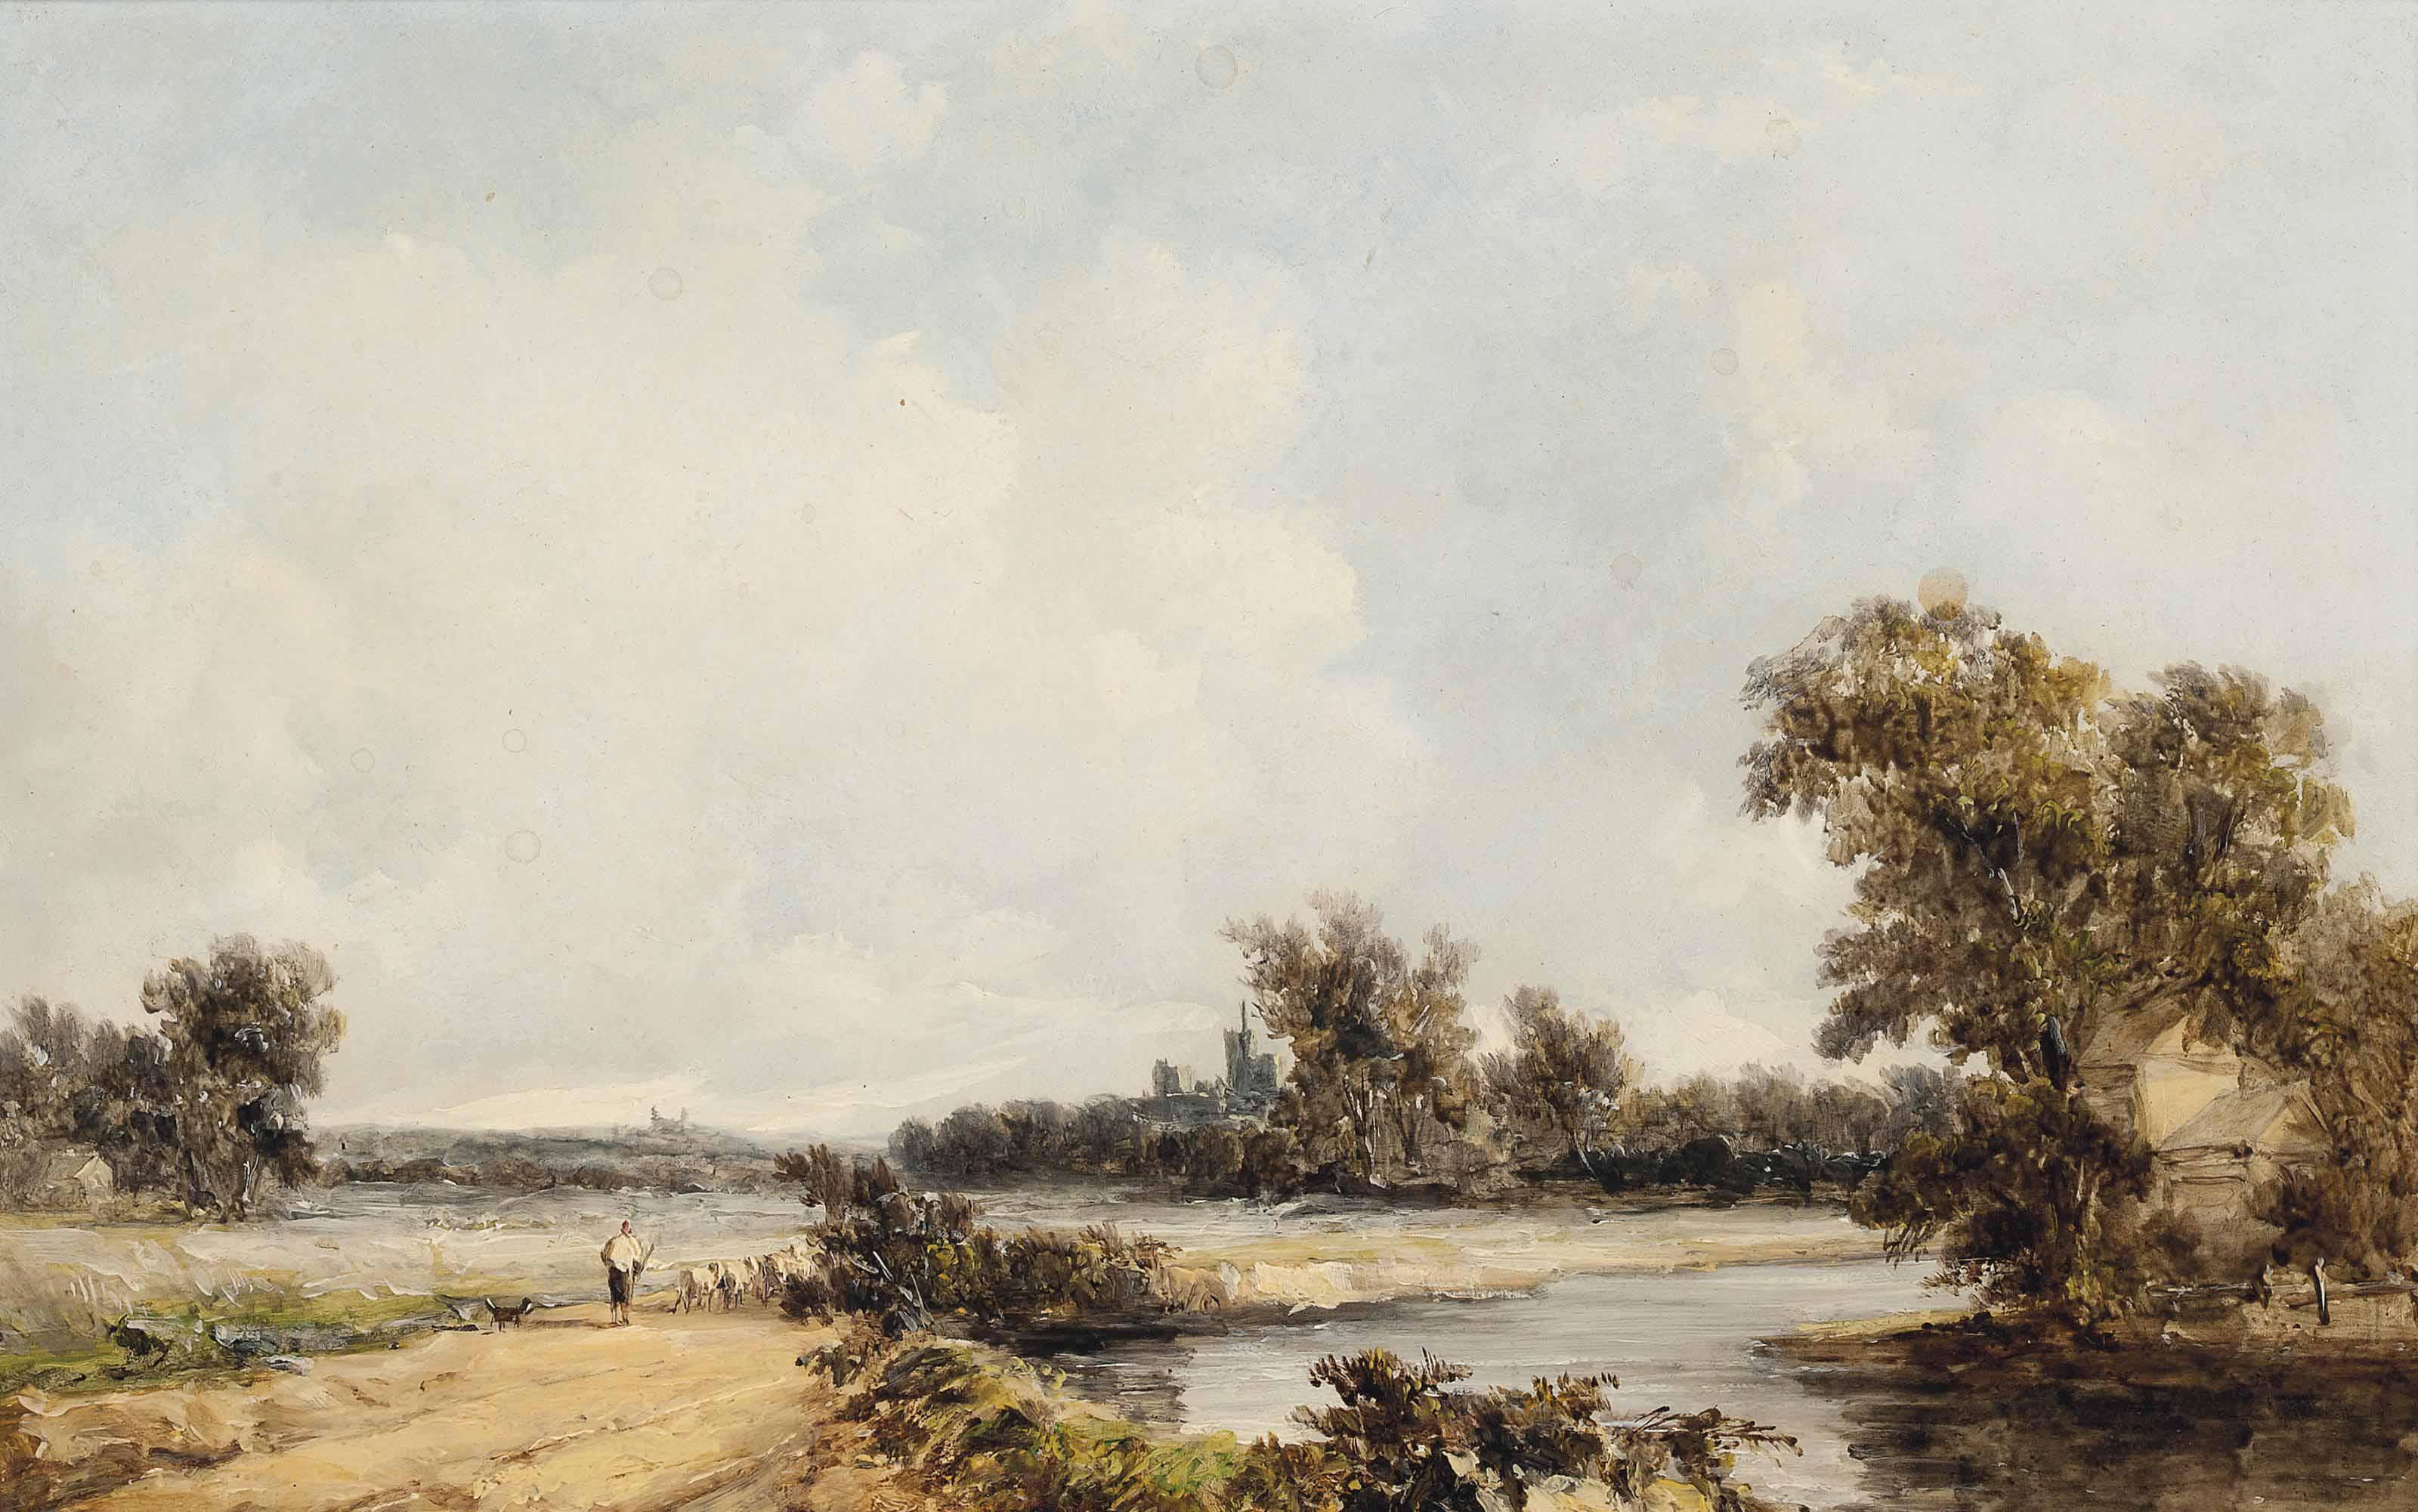 The banks of the Thames, near Eton